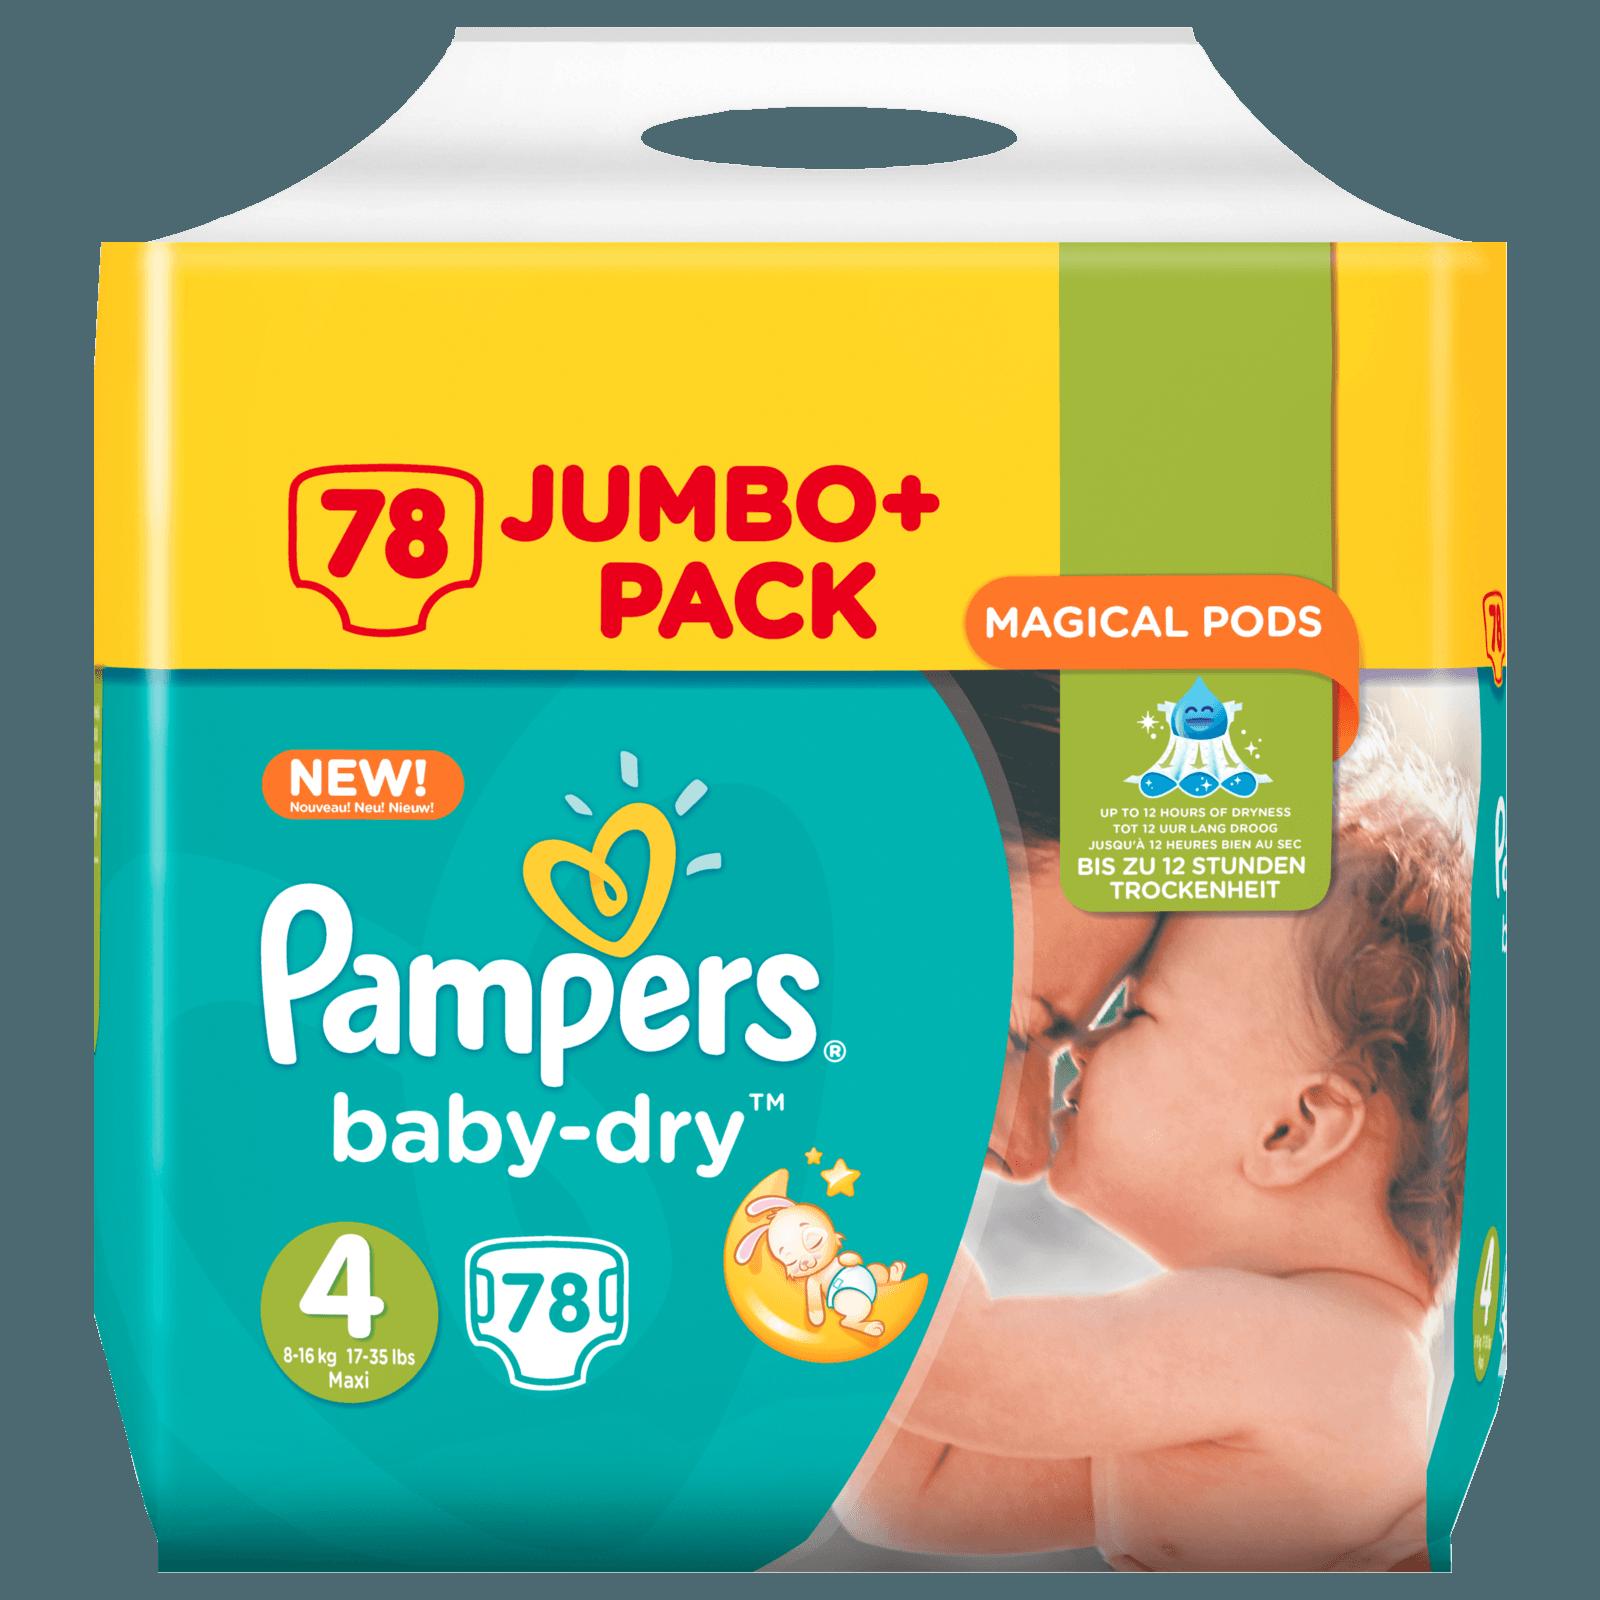 Pampers Baby Dry Gr. 4 Maxi 7-18kg Jumbo Plus Pack 78 Stück